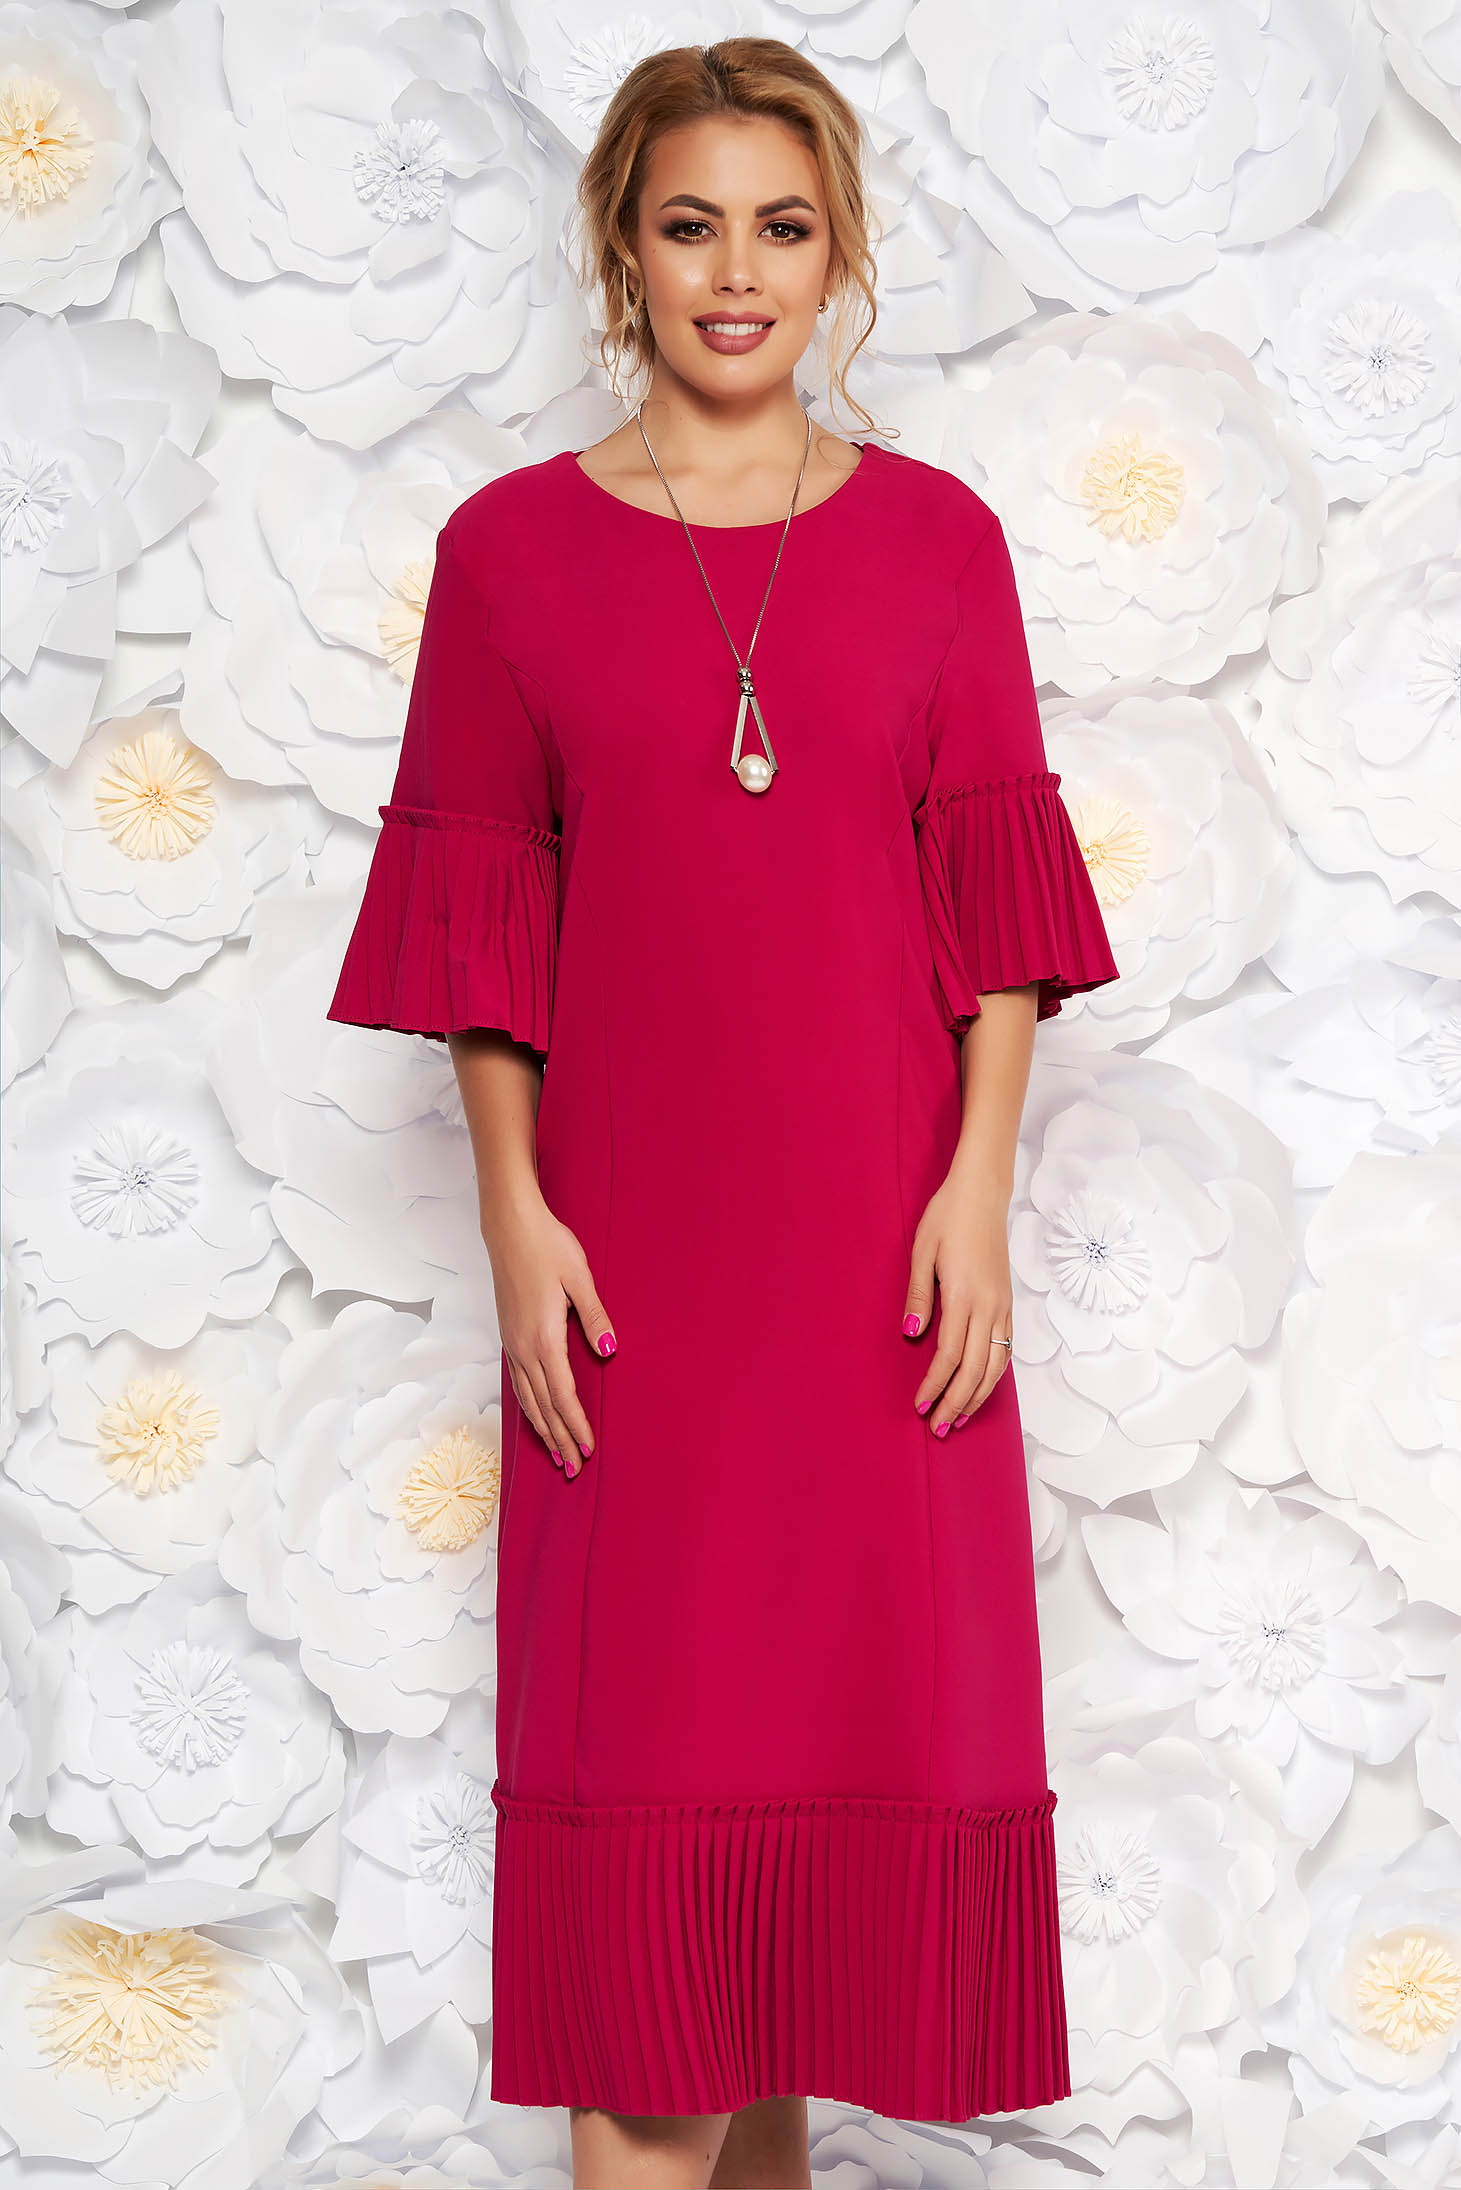 Rochie fuchsia eleganta midi cu un croi drept din stofa usor elastica